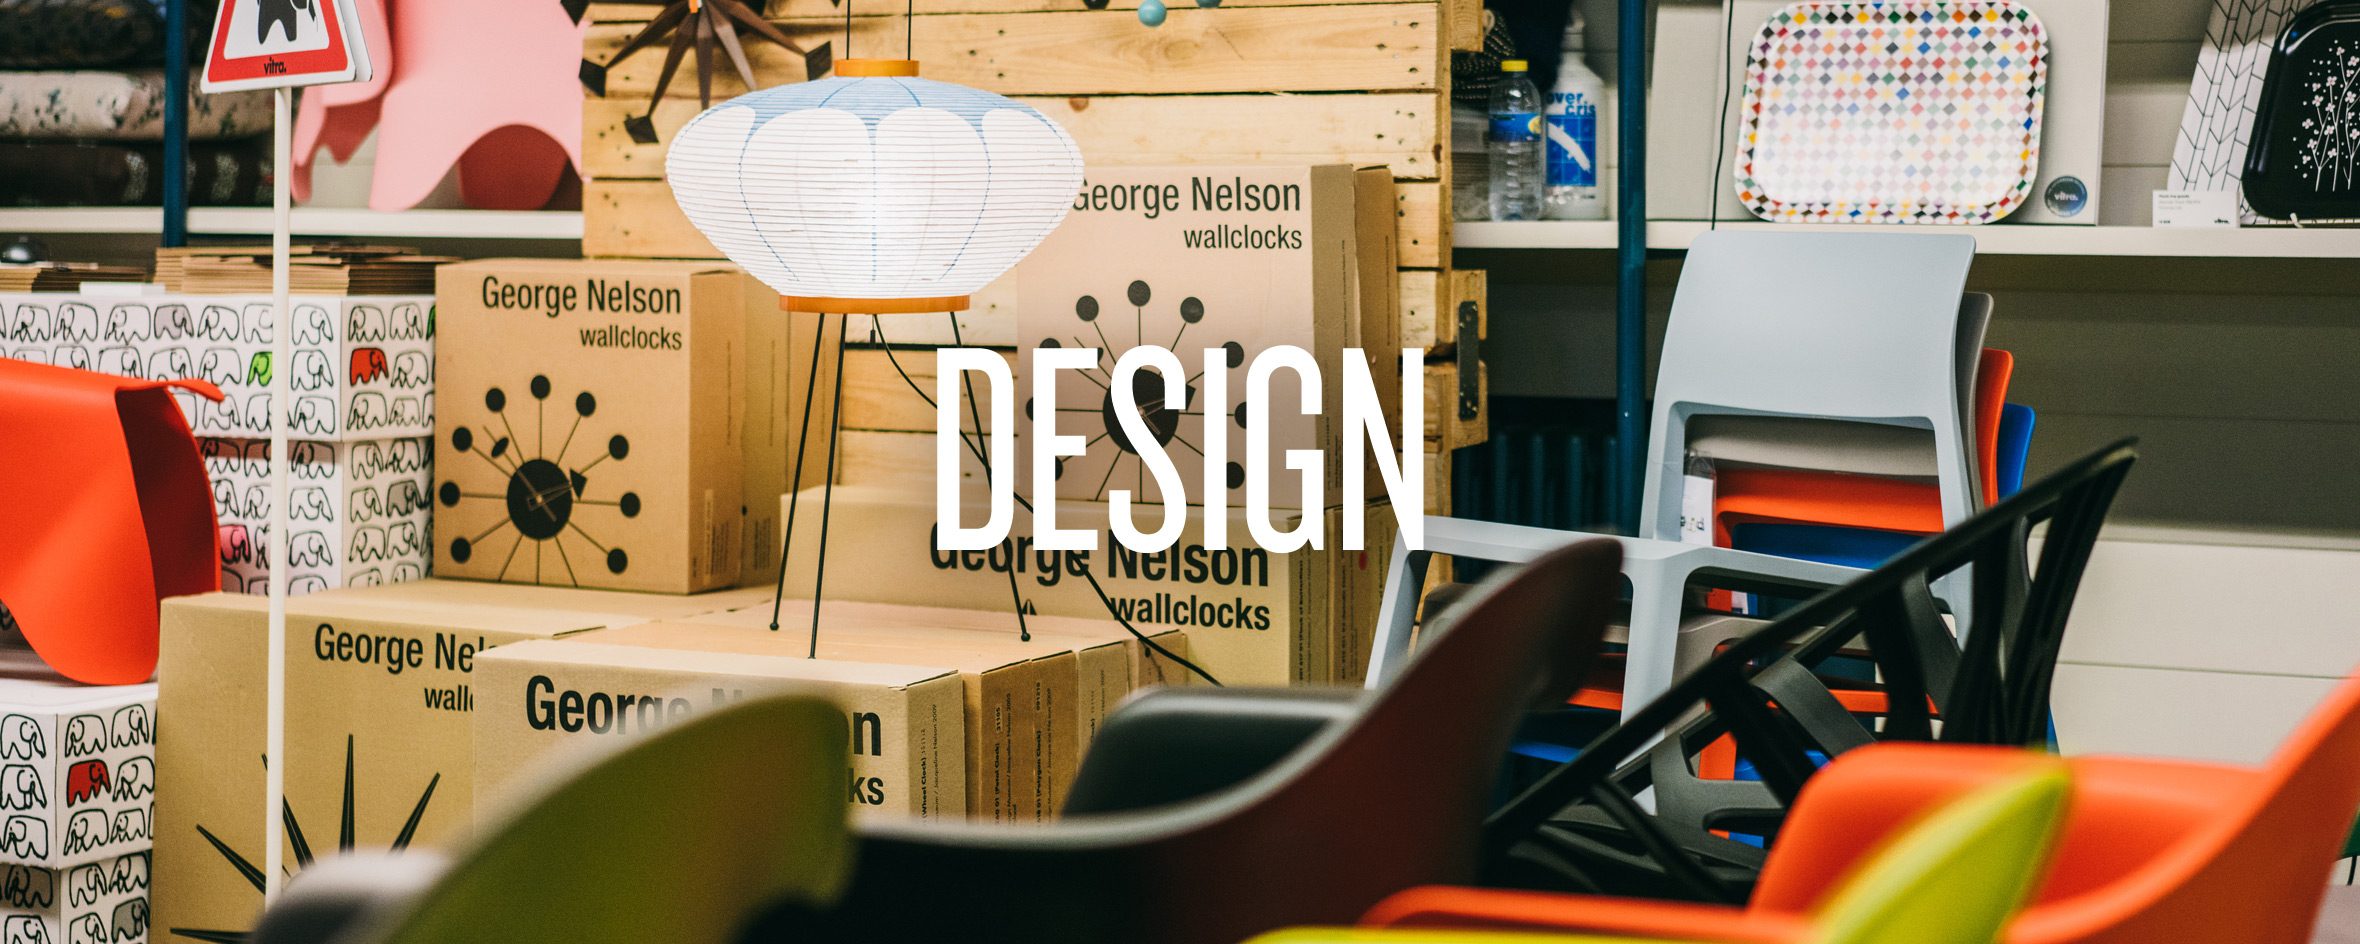 02_design palo alto